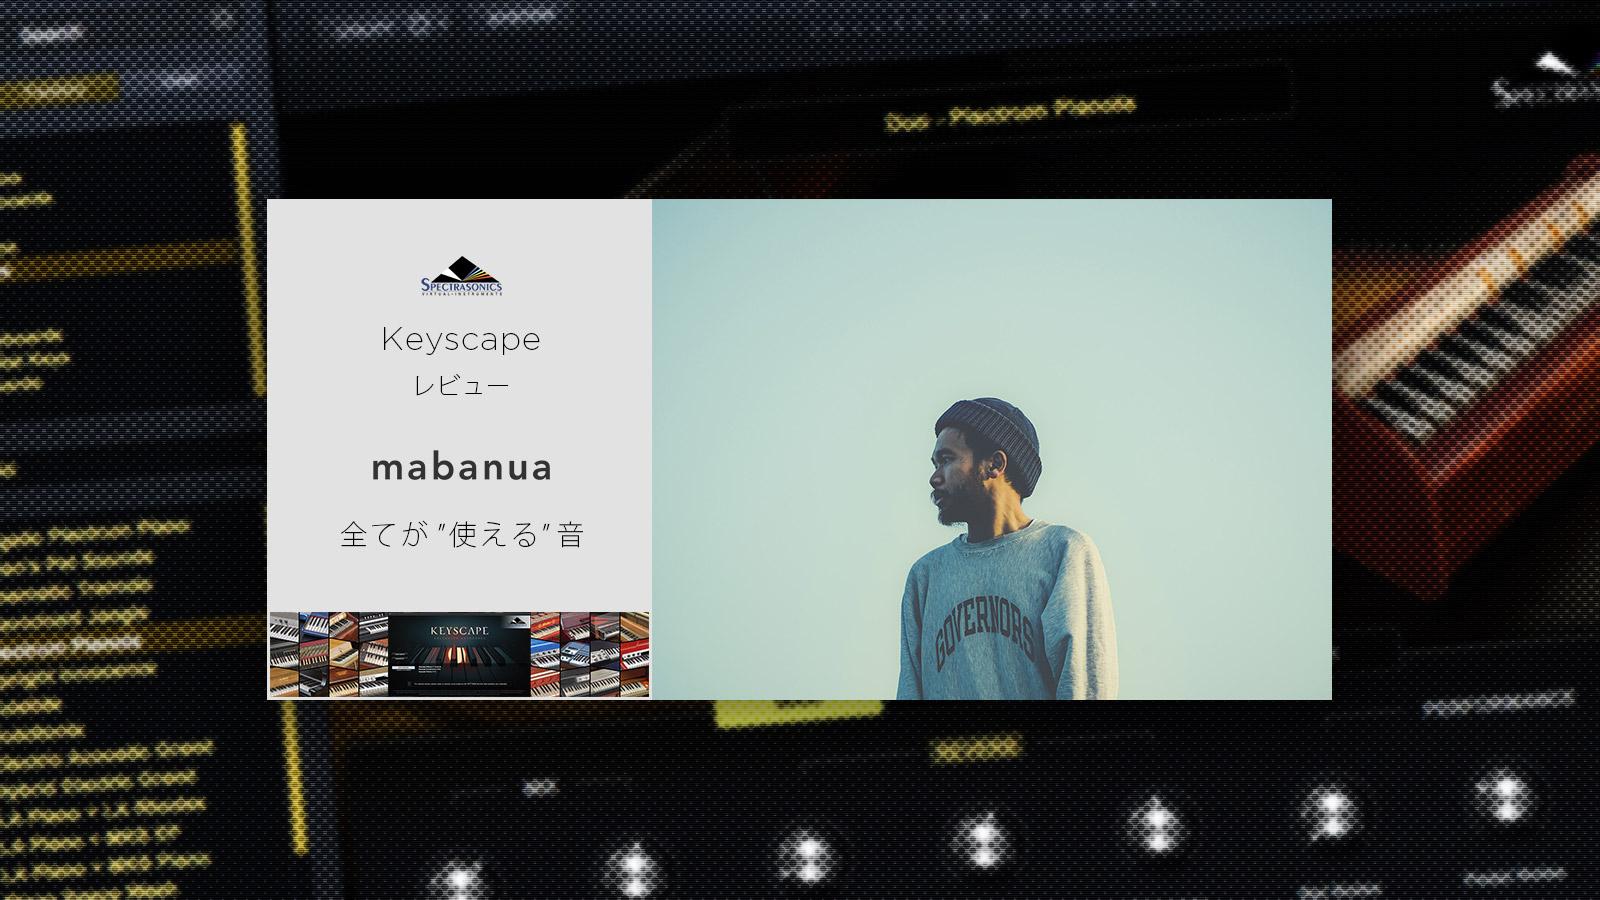 Keyscapeレビュー:mabanua